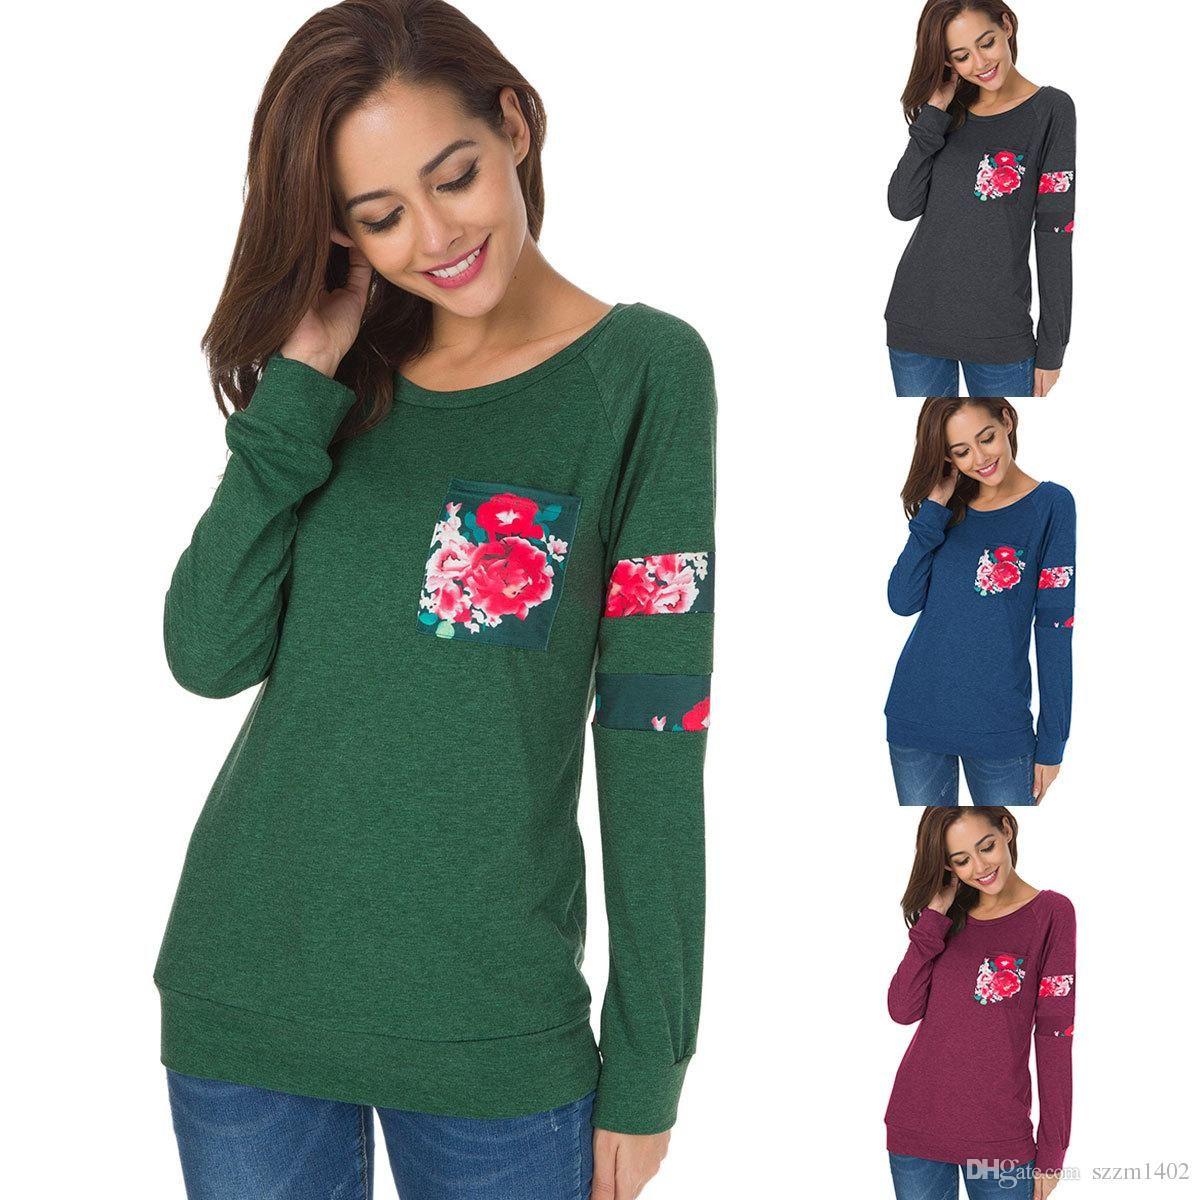 937a9059a45f New Women Floral Printing T-shirt Girls Long Sleeve Causal T-Shirt Loose  Tops  Tees Spring Autumn Women Cotton Clothing New Women Floral Printing T- shirt ...